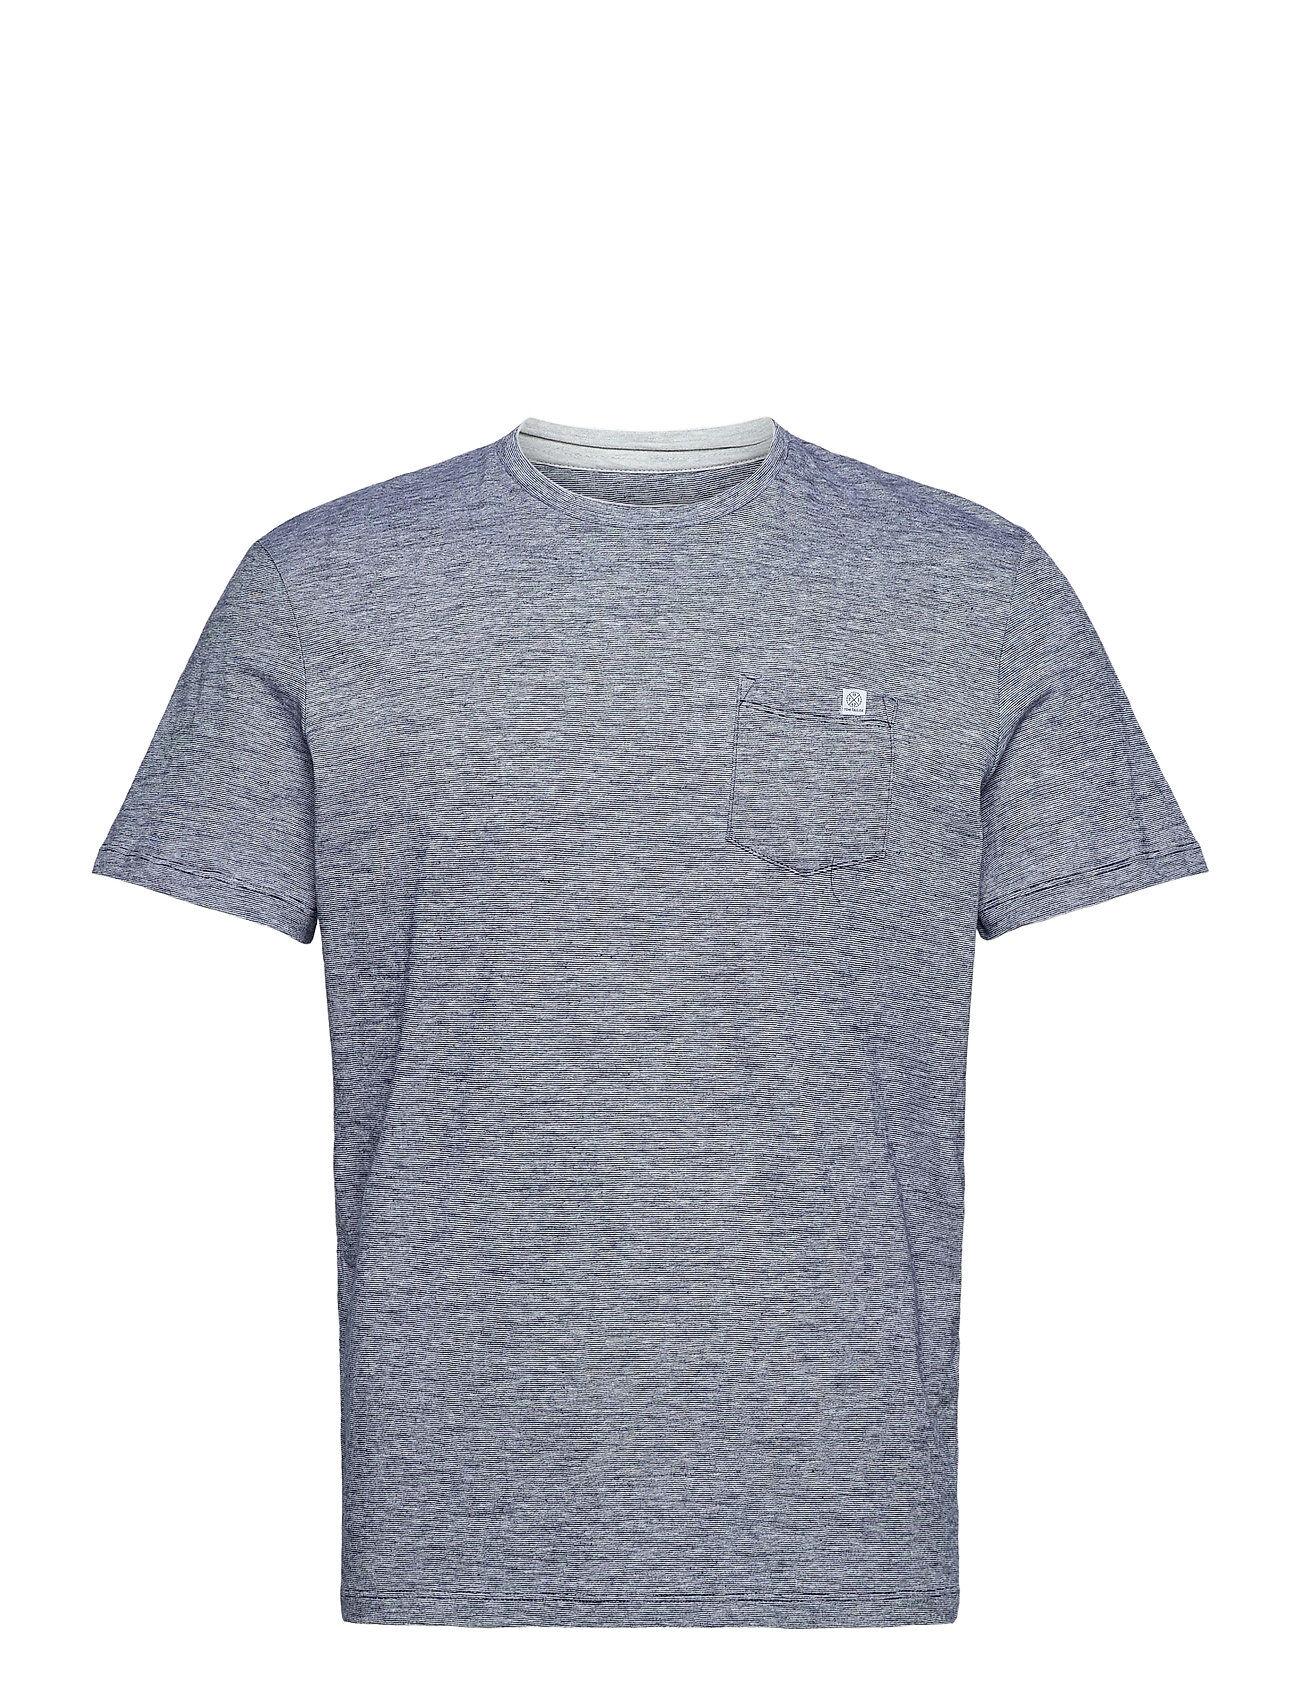 Tom Tailor Fineliner T- T-shirts Short-sleeved Harmaa Tom Tailor